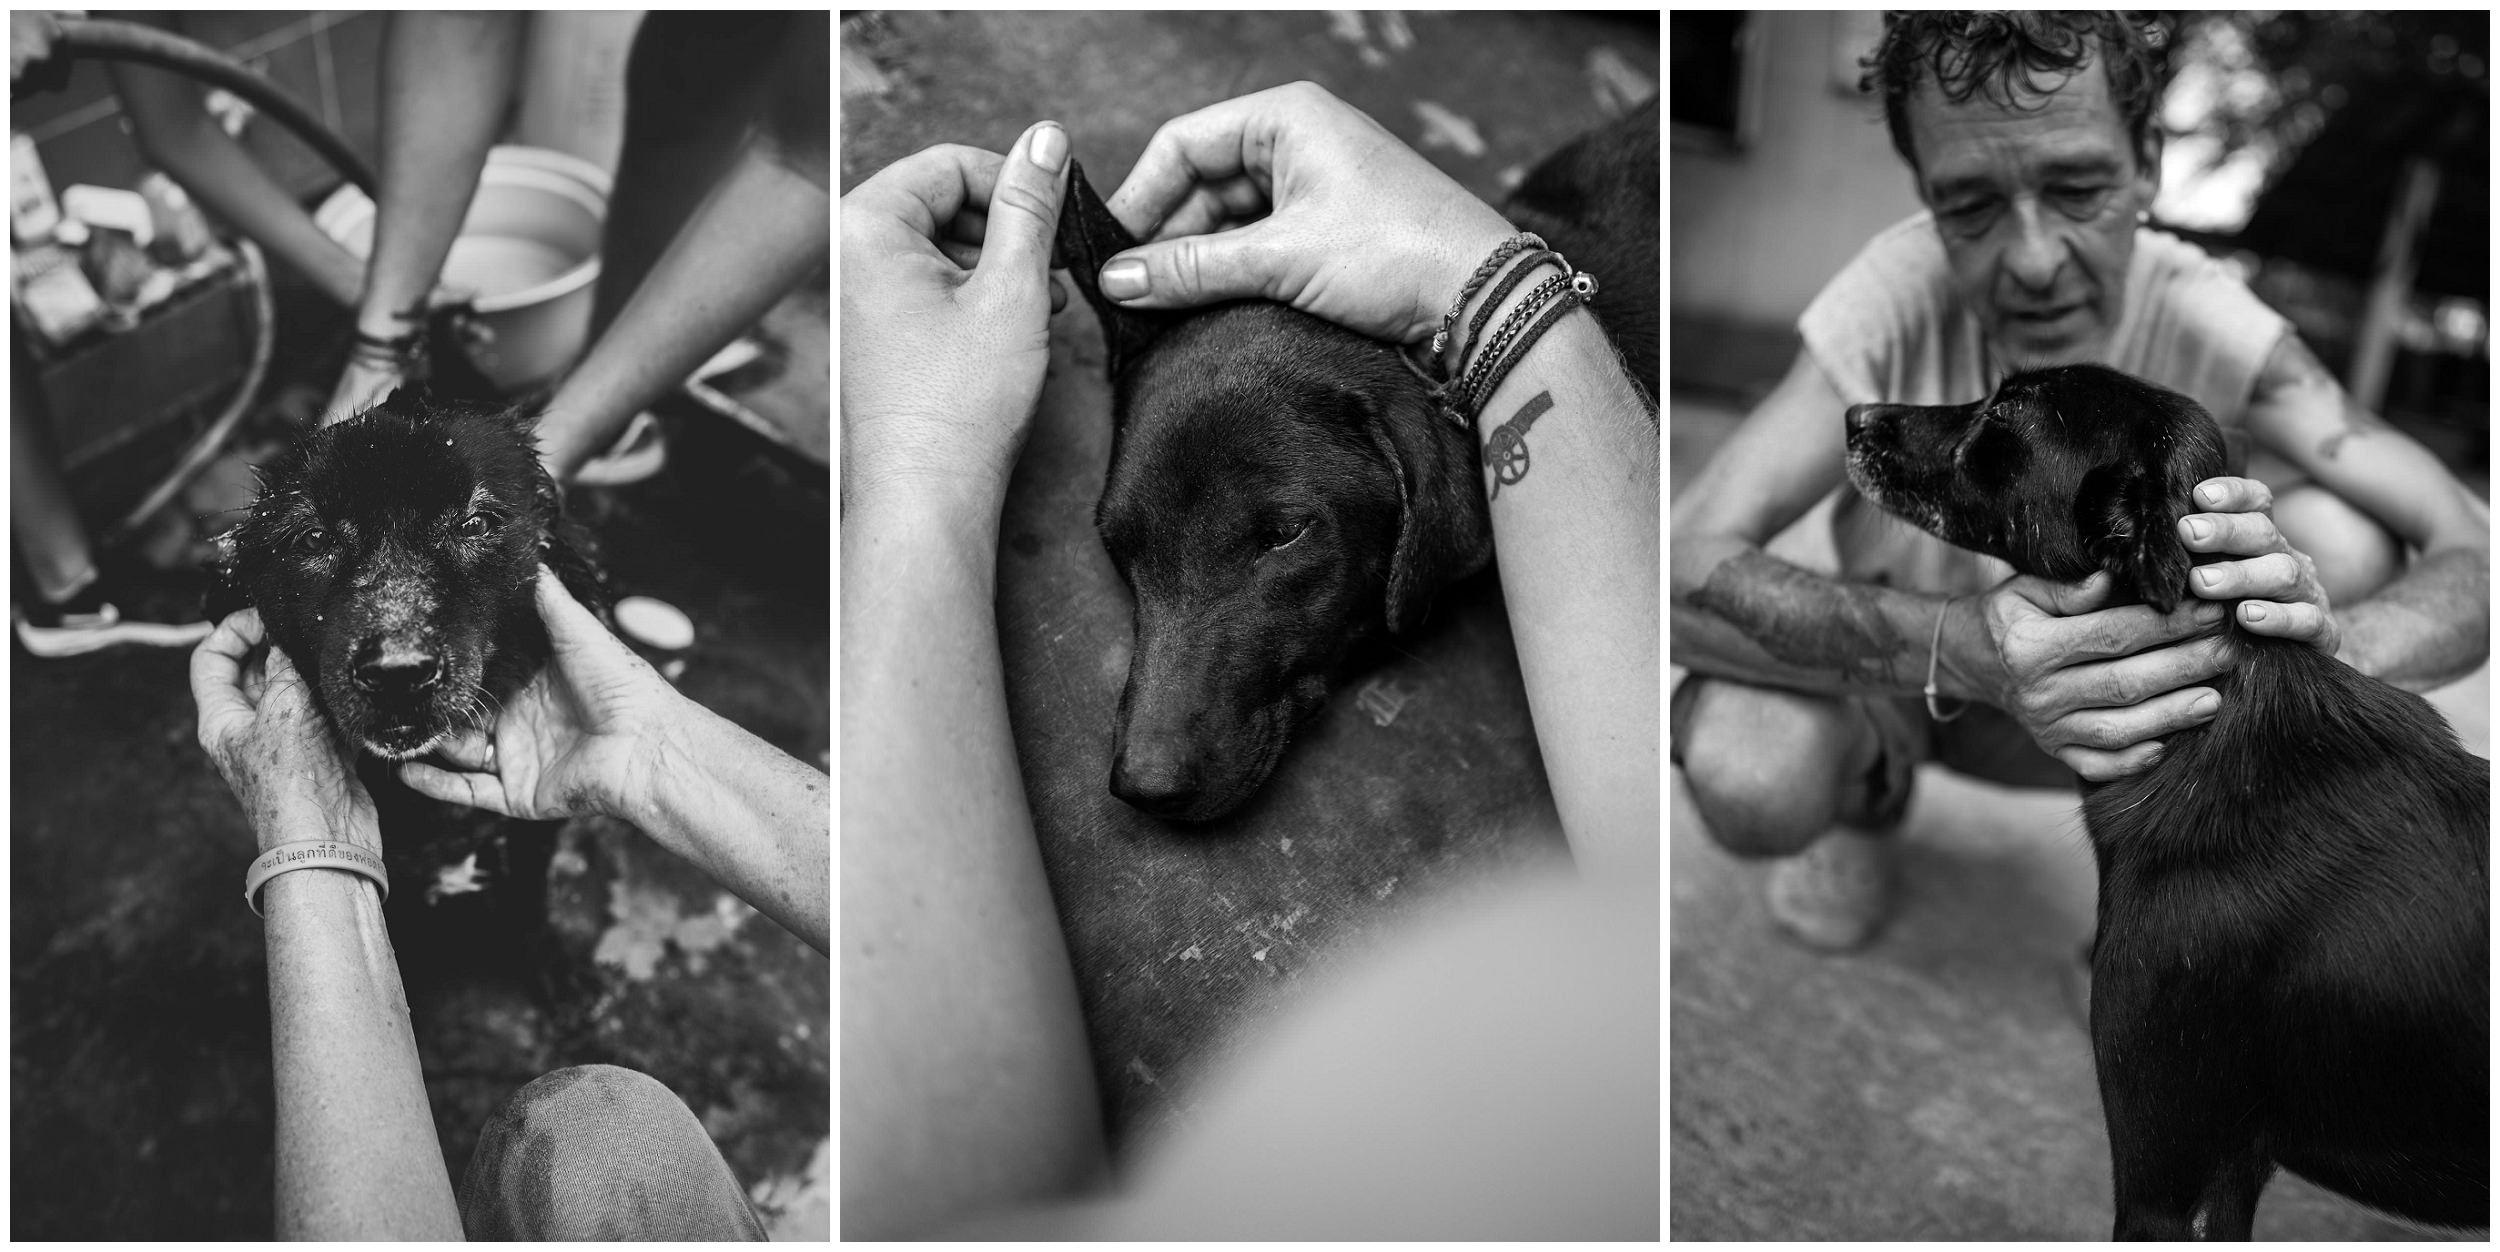 Headrock, dogs, shelter, rescue, people, hands, compassion, care, bang saphan, thailand, honden, straathonden, opvangcentrum, rehabilitatie, rehabilitation, asiel, verzorging, compassie, caitlin young, oskar kolm, jessica brunnberg, jena berg, alexa criste